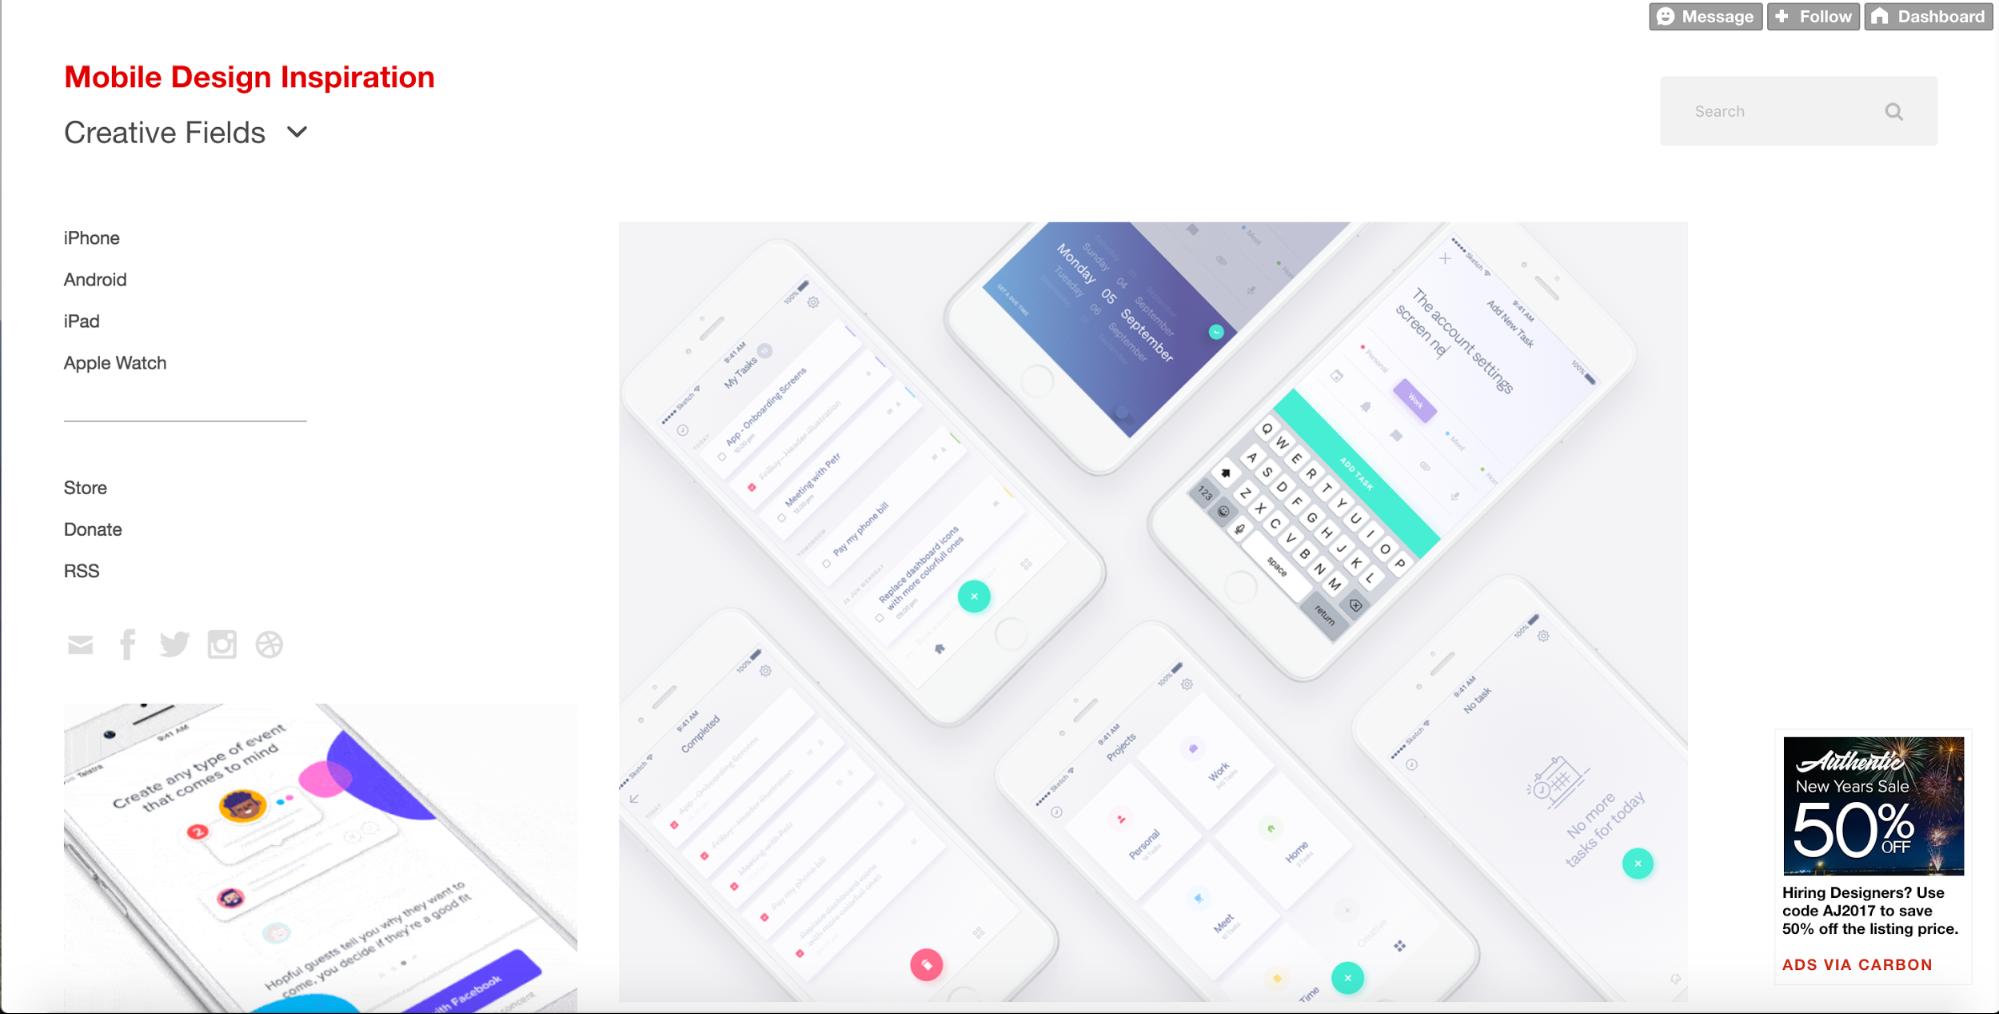 Mobile Design Inspiration homepage